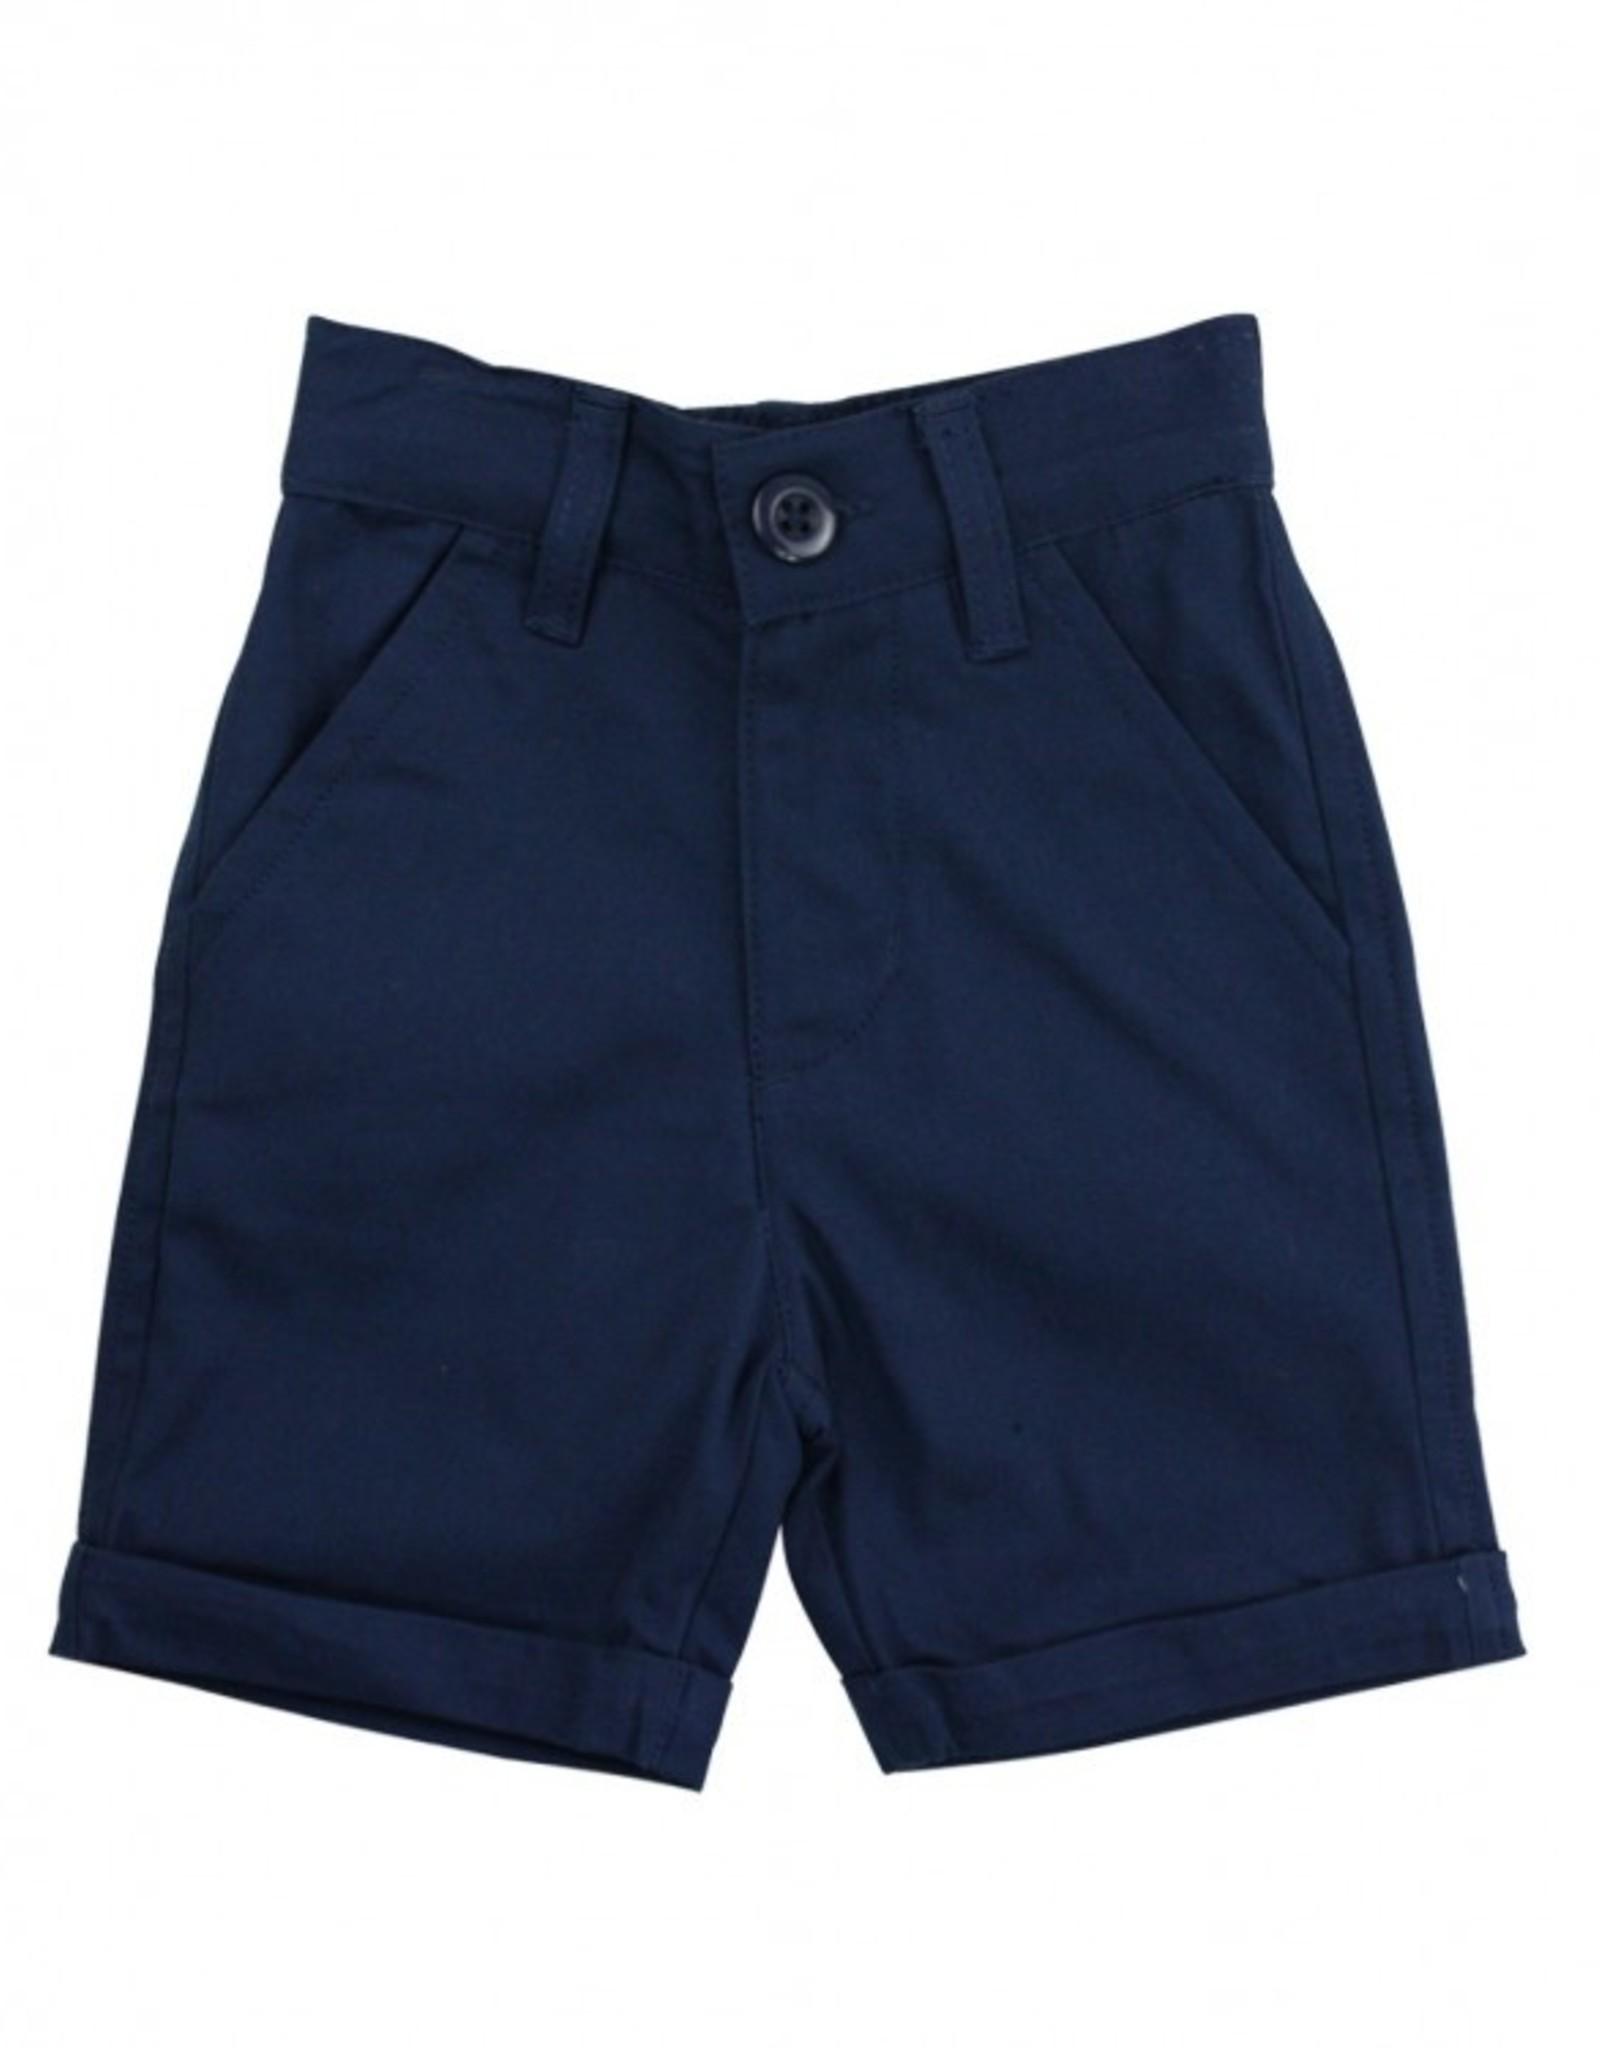 RuggedButts Navy Cuffed Chino Shorts 12-18 months